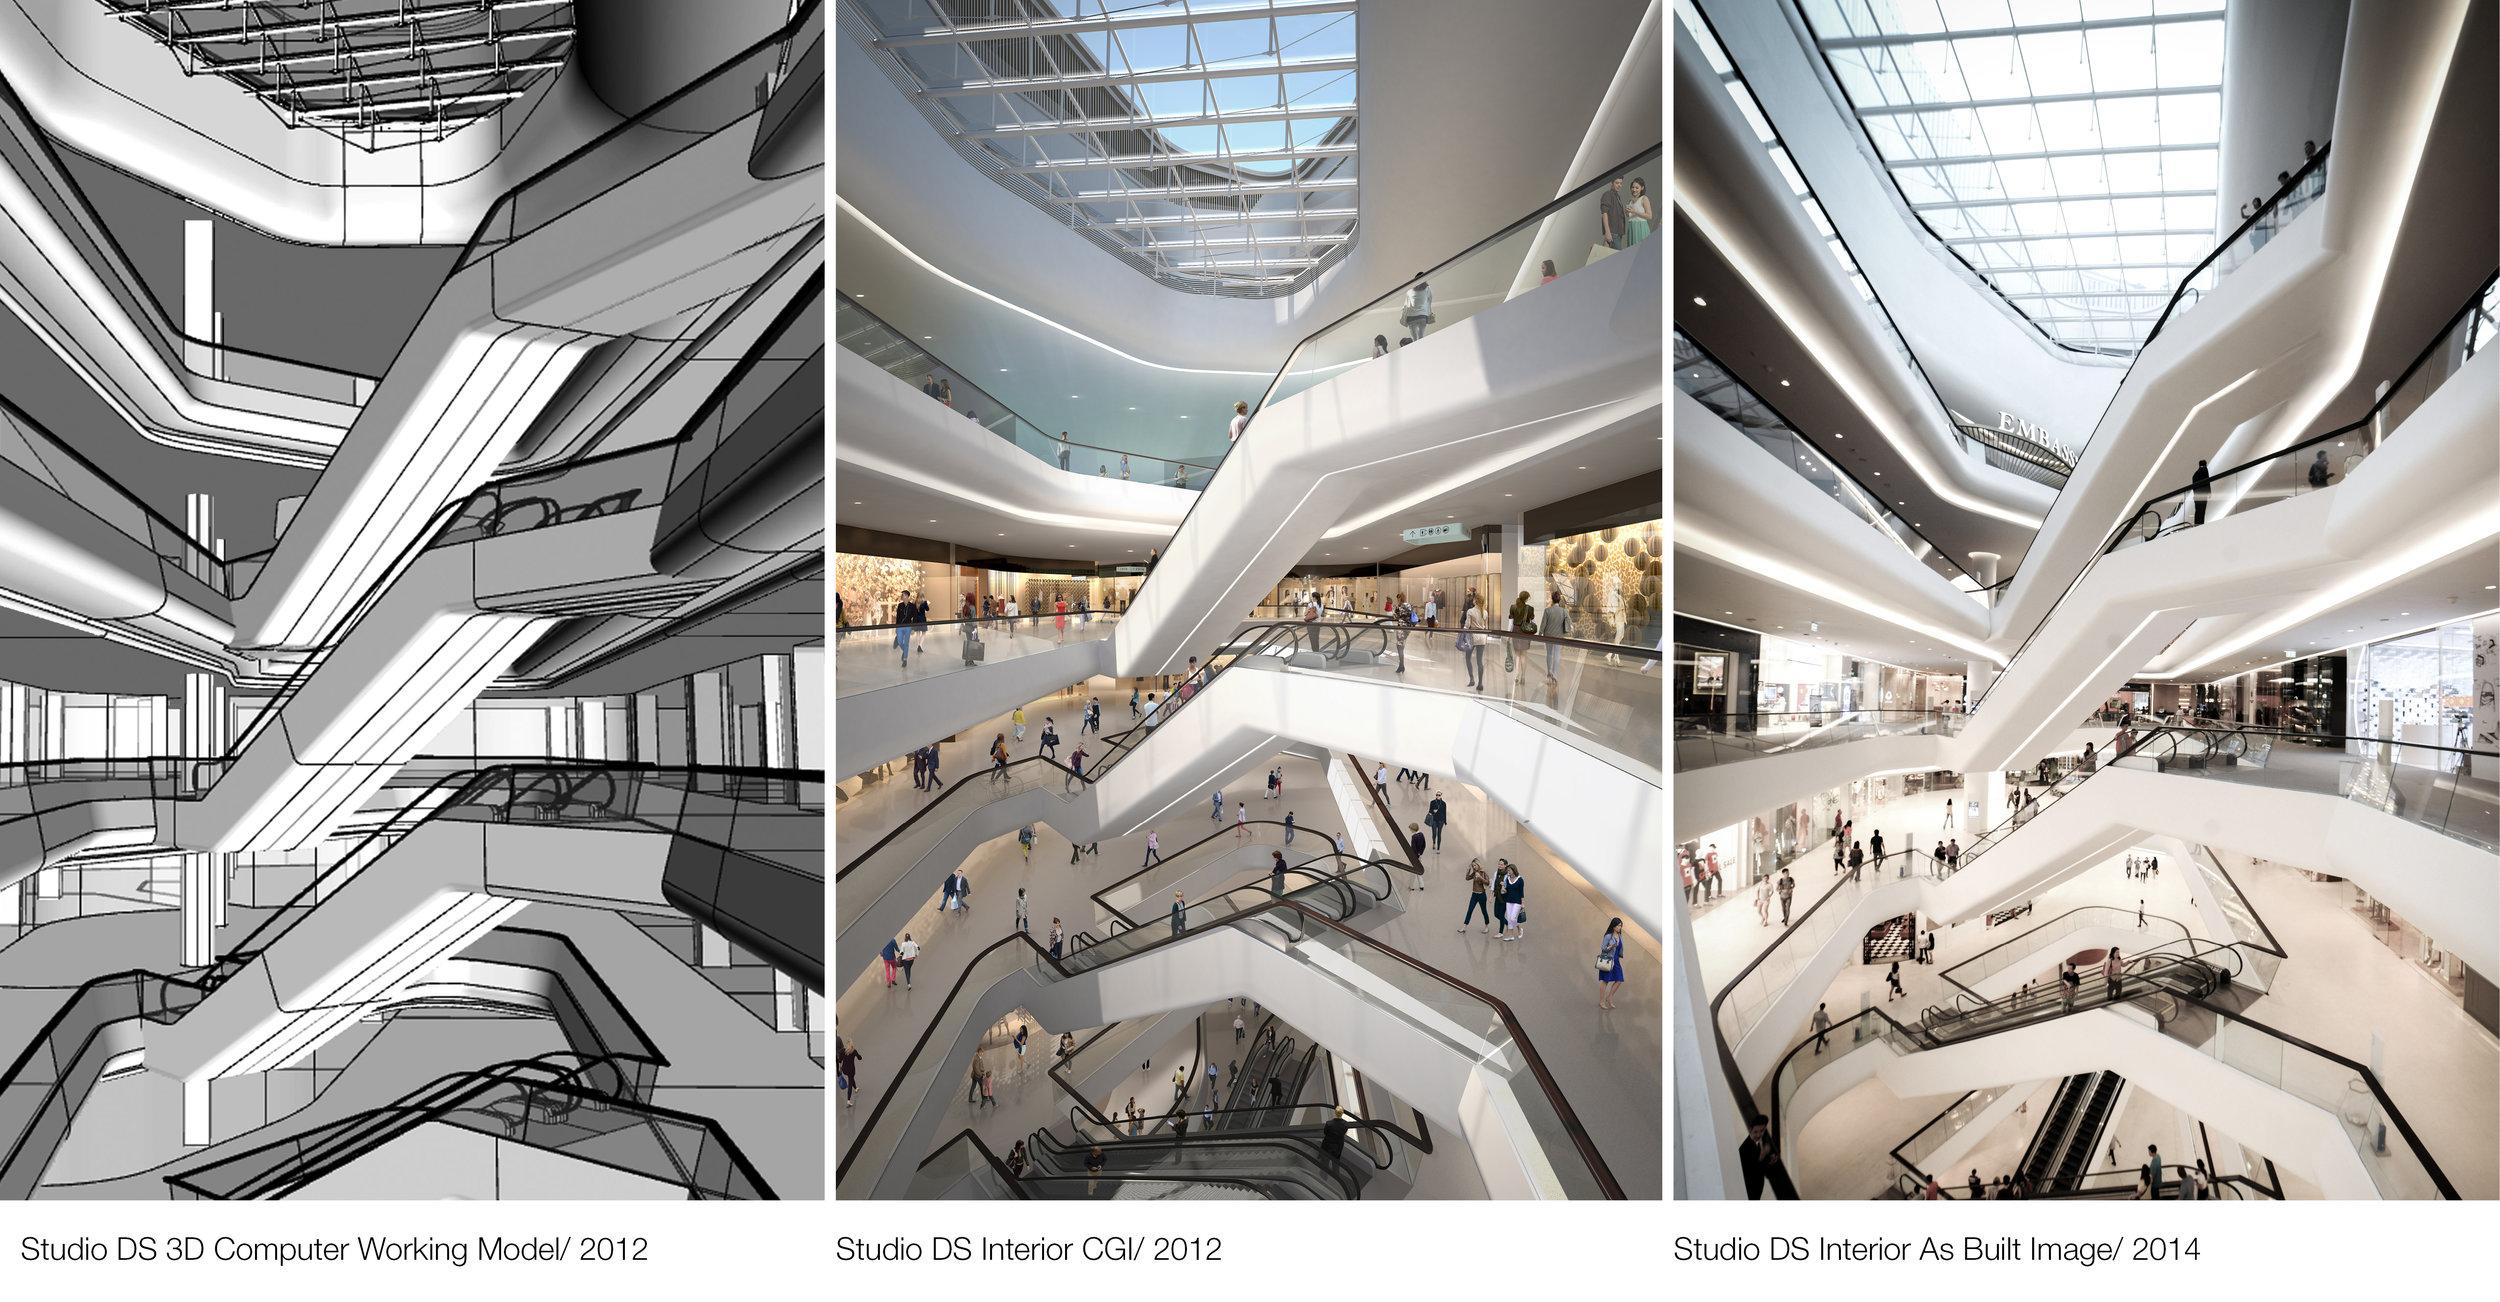 © Copyright Studio DS 2018 - Central Embassy Interior Design Comparison